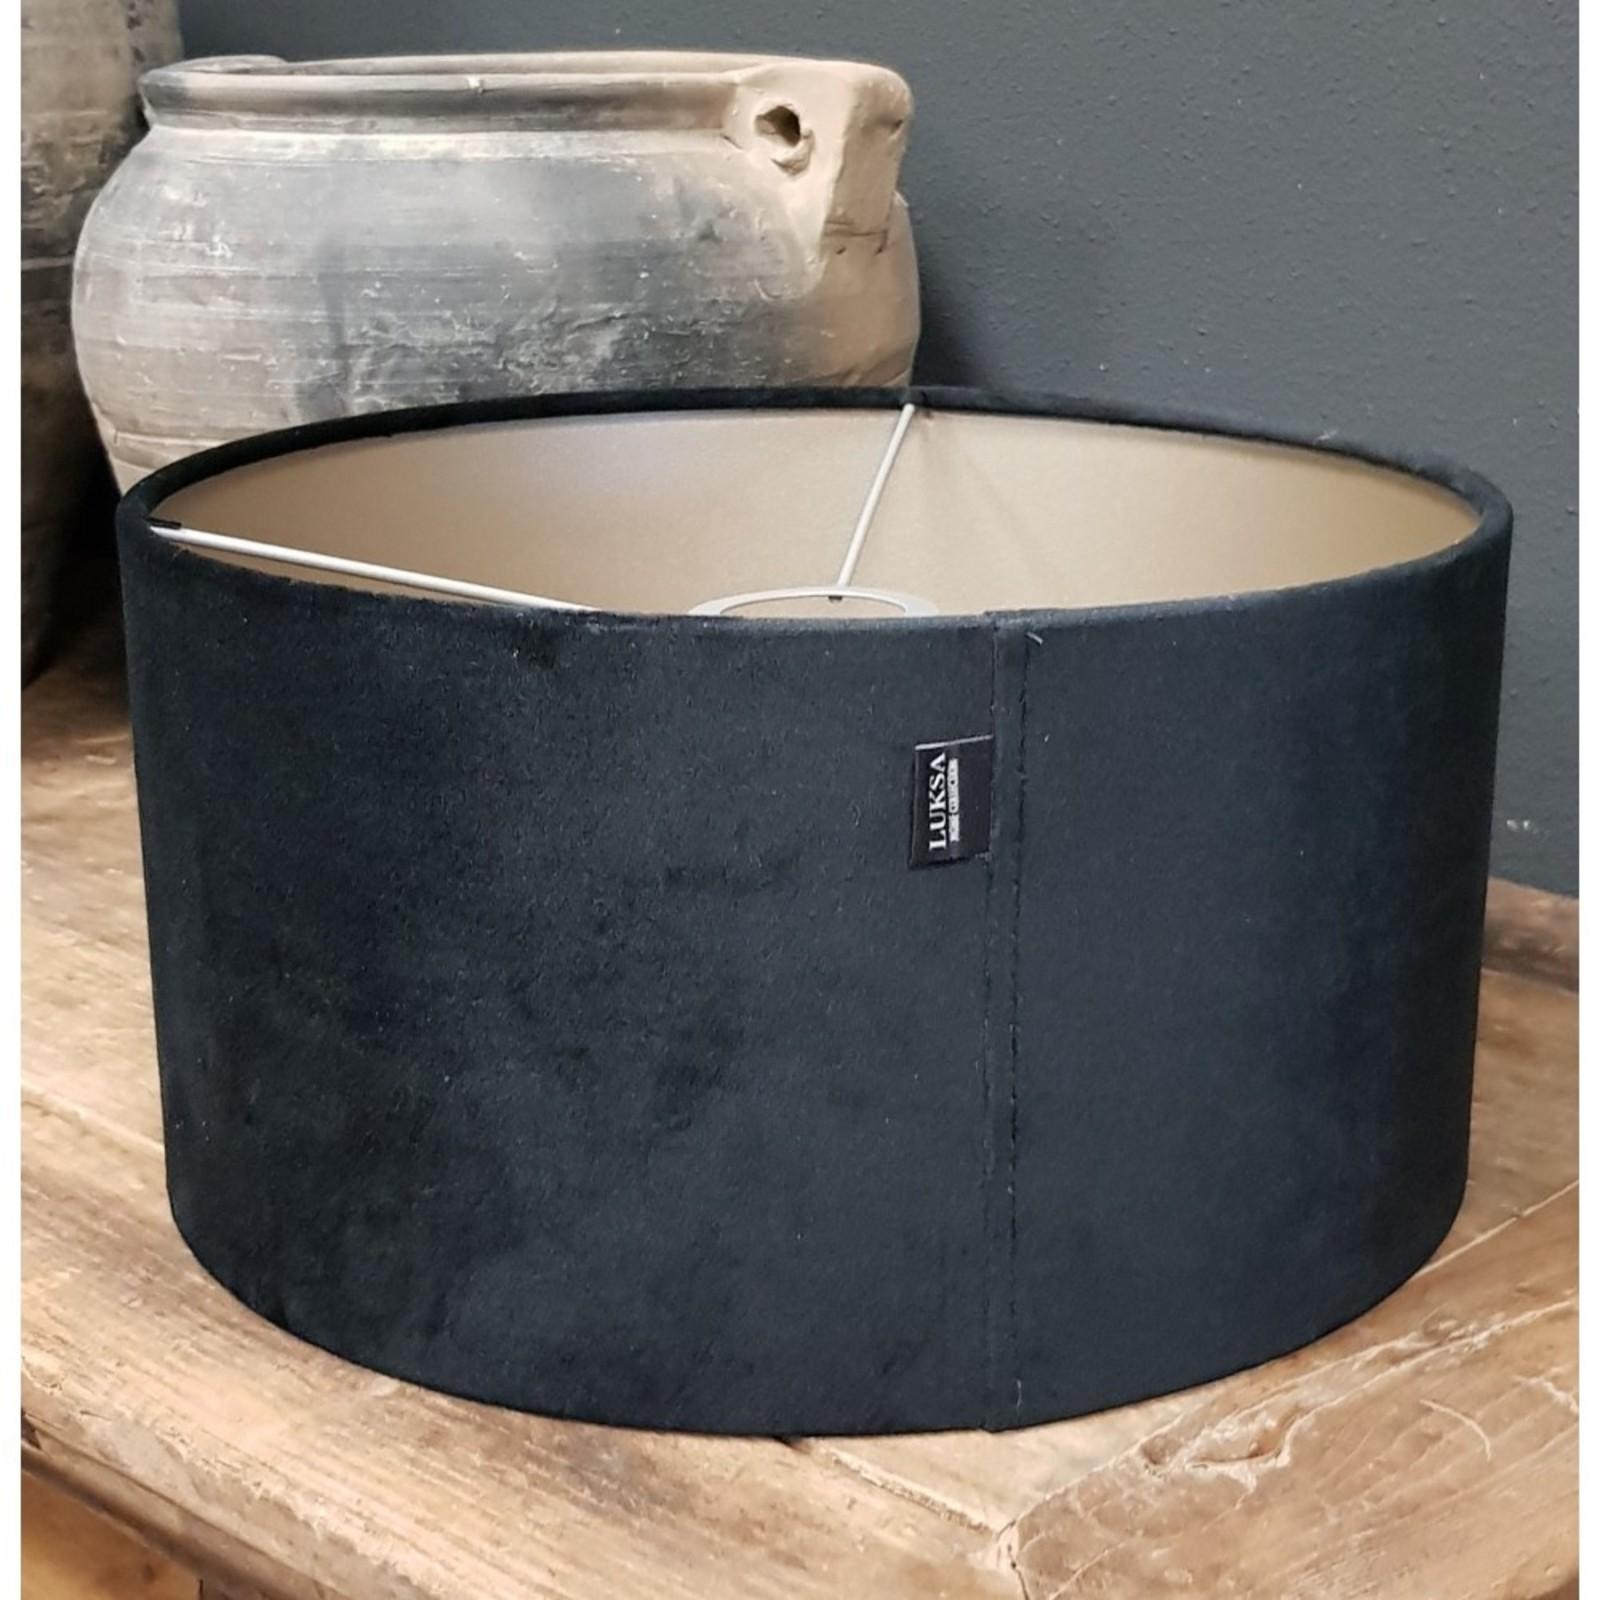 Luksa Kap cilinder Velvet zwart CAS66